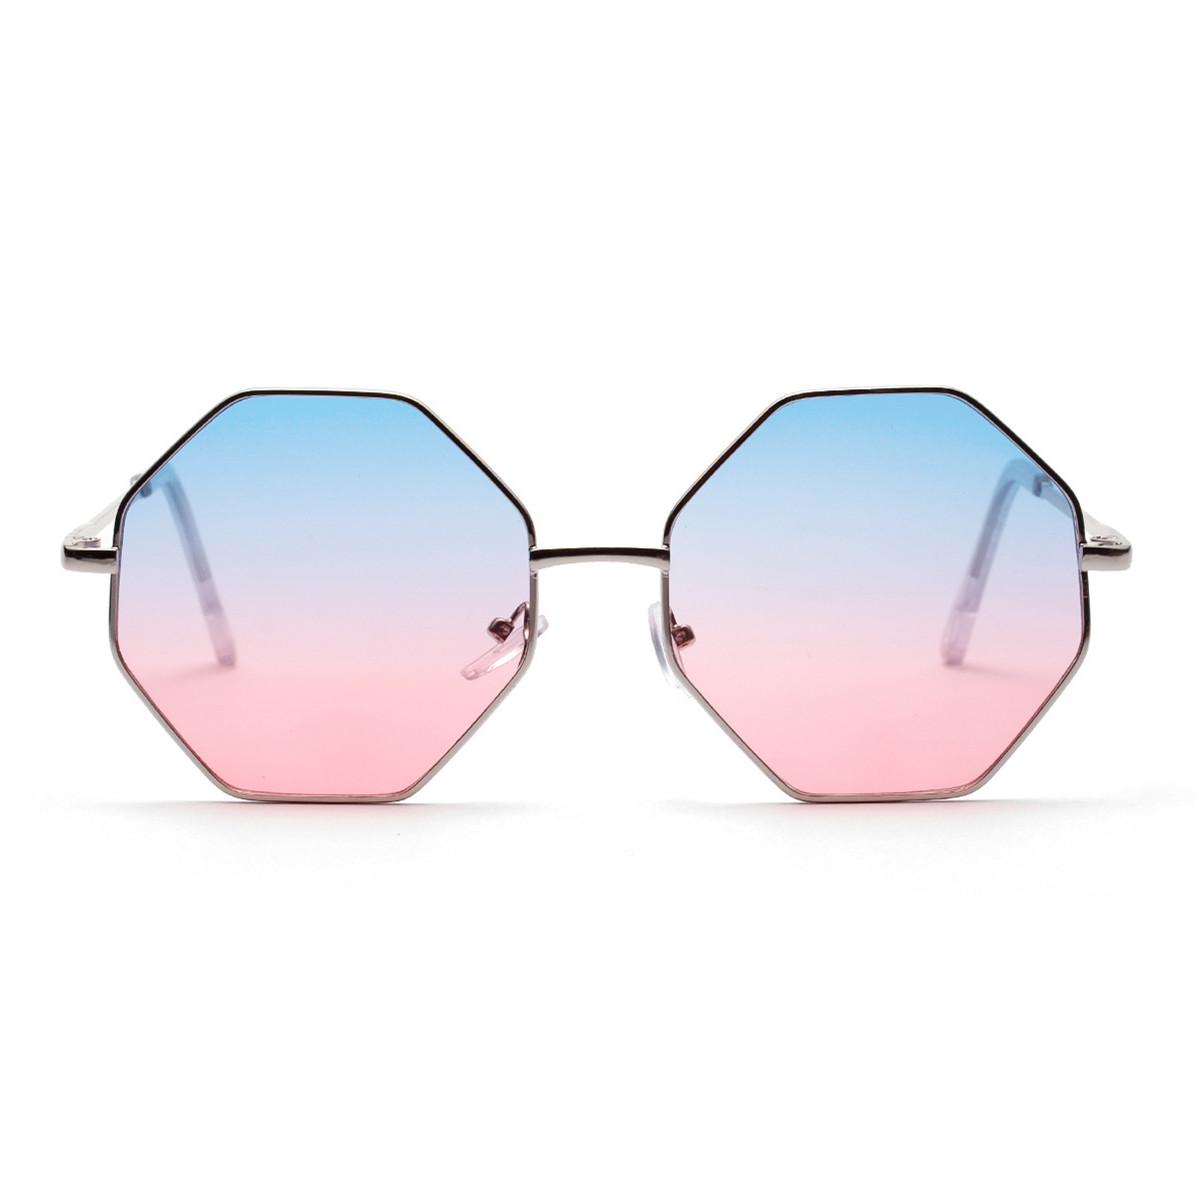 WENZHE New Cool Irregular Metal Sunglasses Frames Women Sunglasses Featured Image